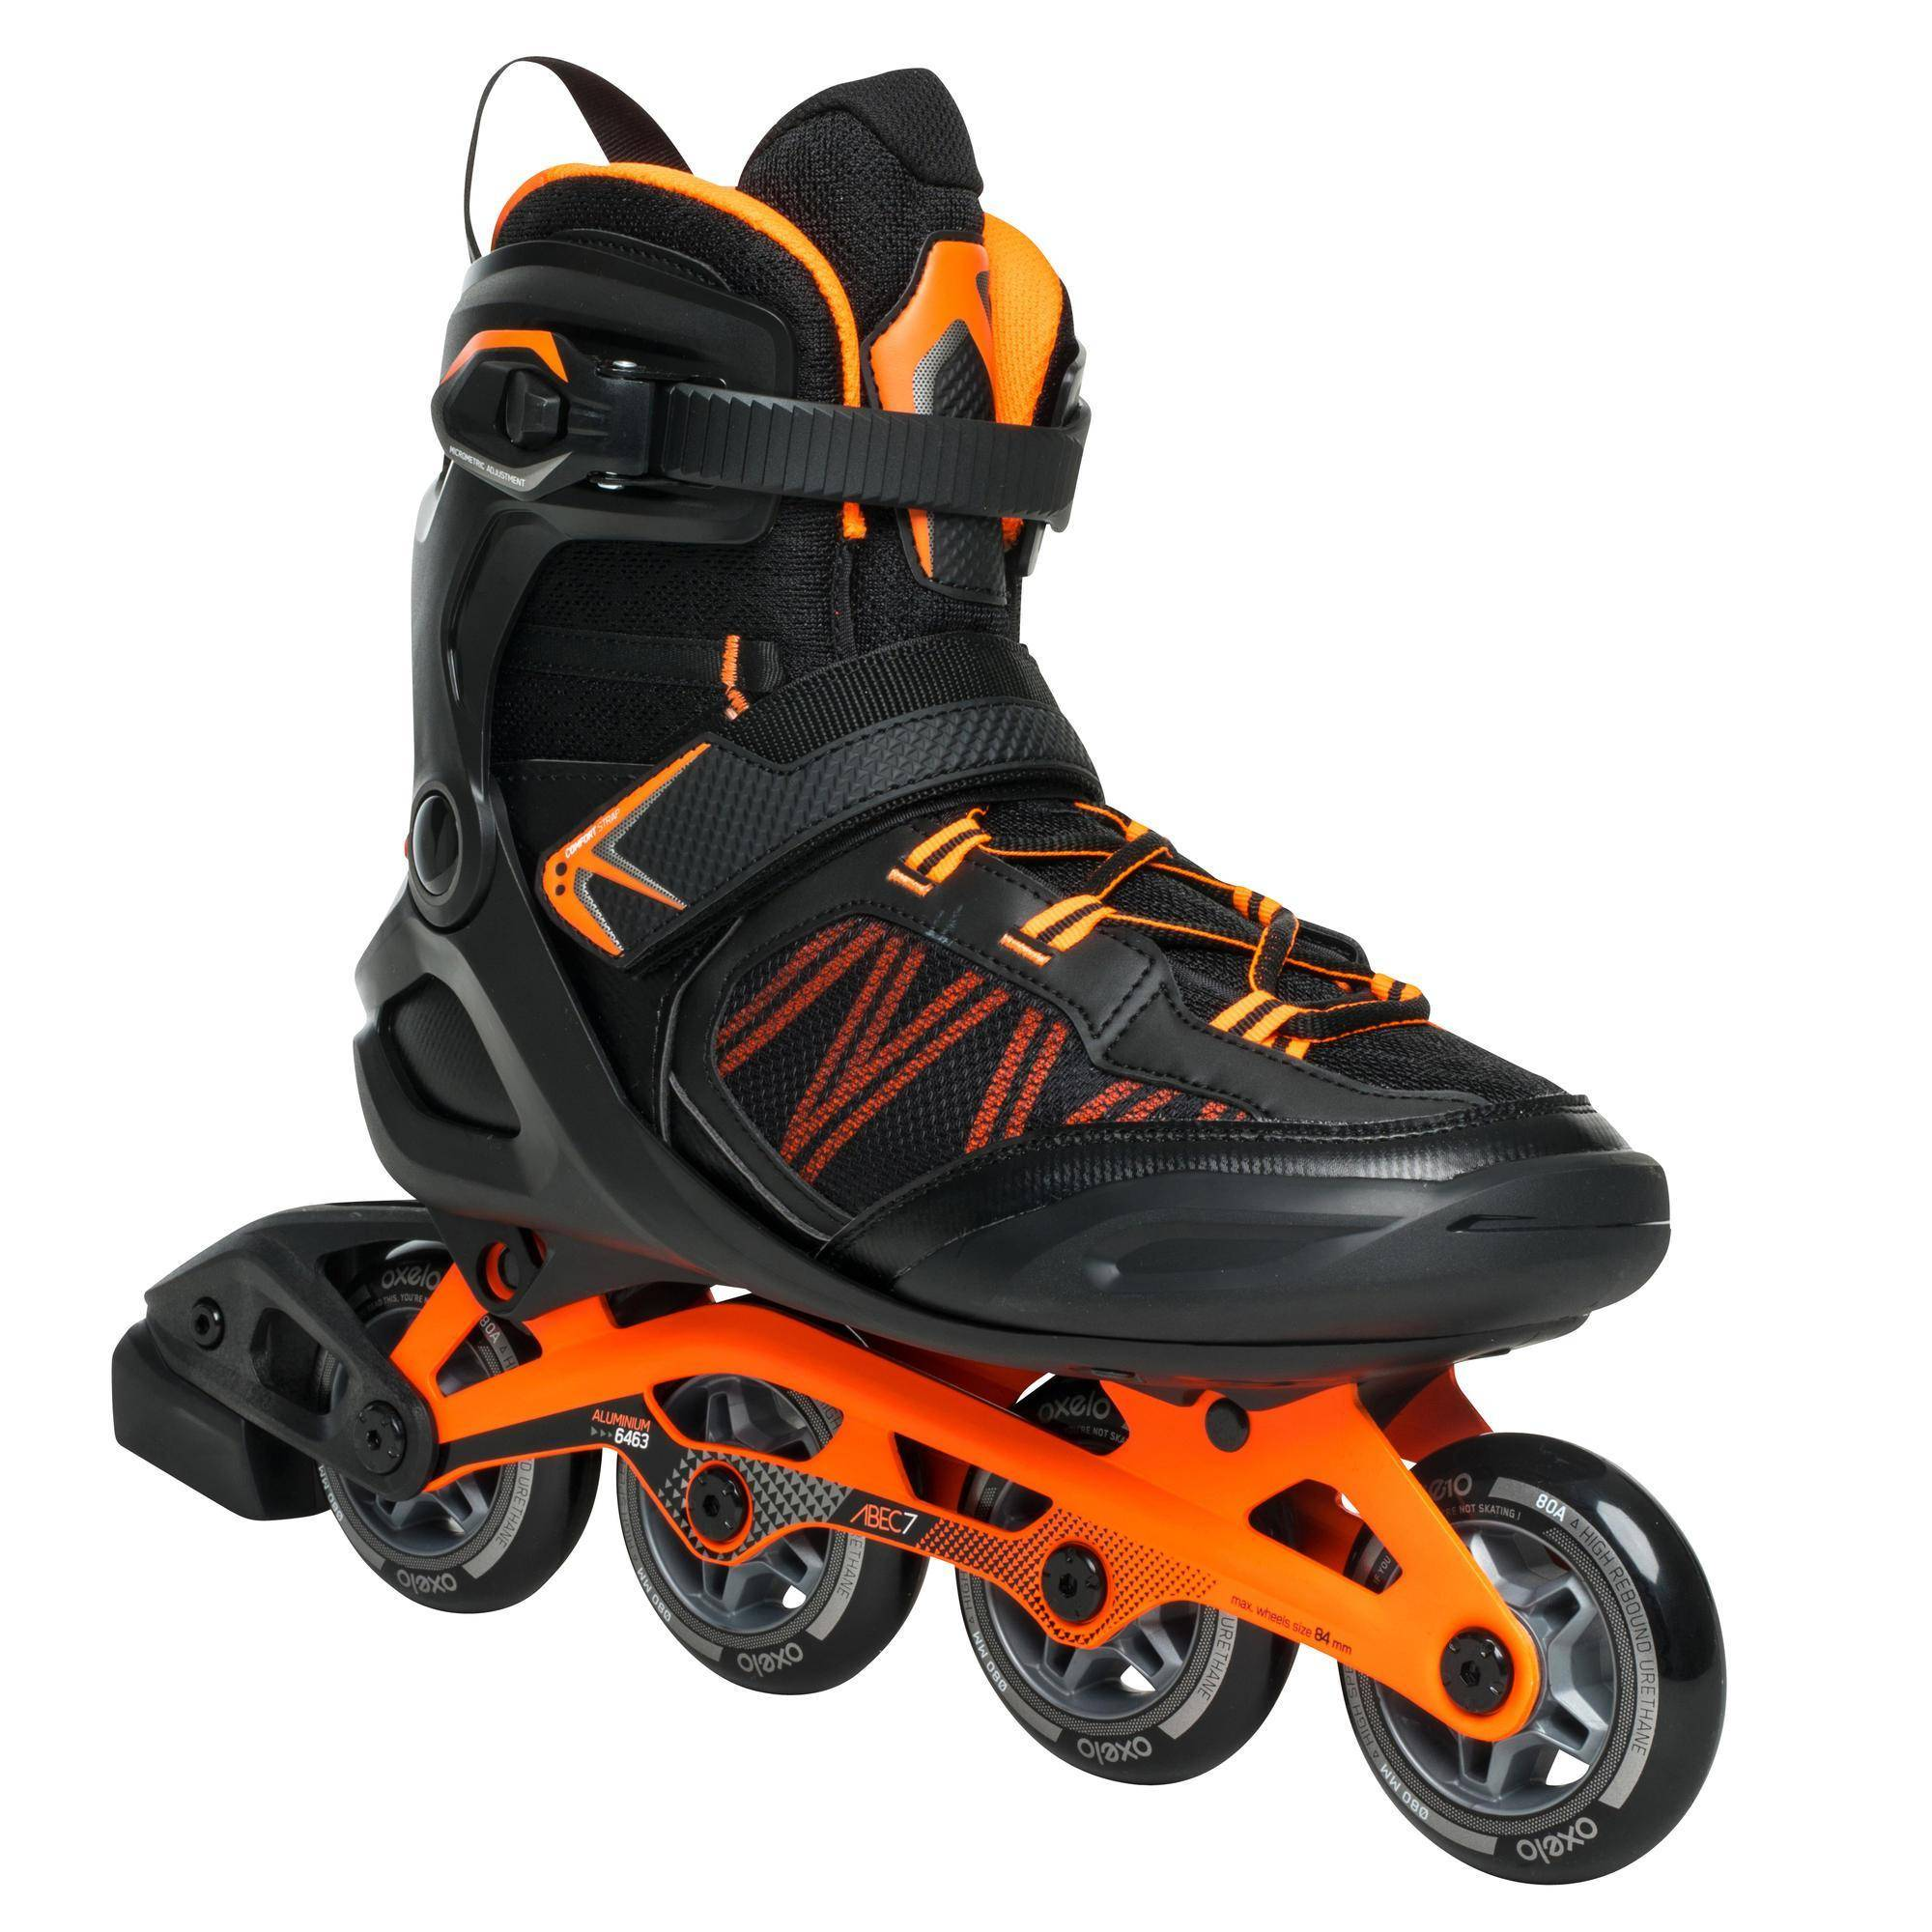 Oxelo Roller fitness homme FIT500 acid orange - Oxelo